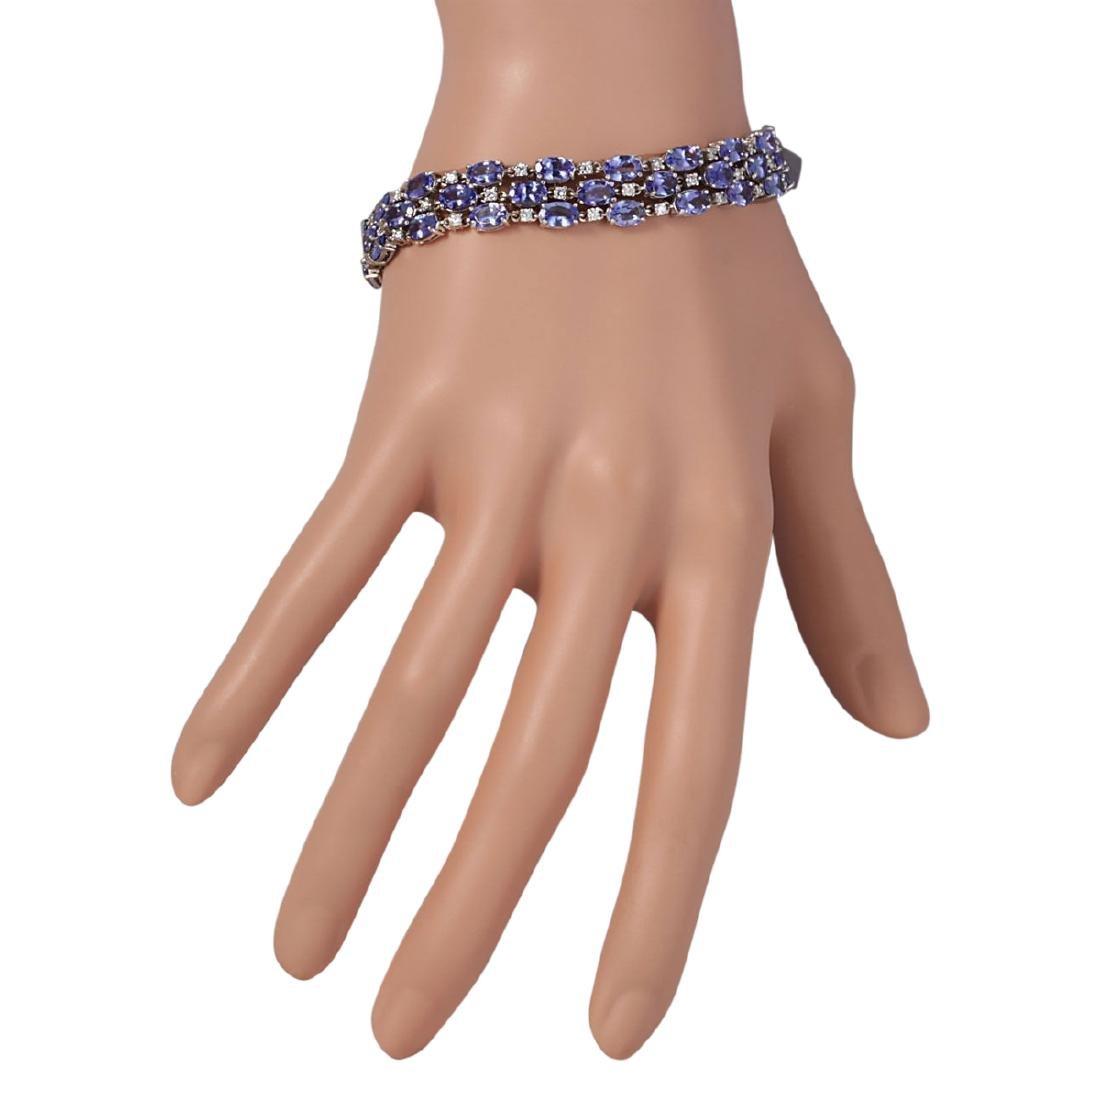 23.85 CTW Natural Tanzanite And Dimond Bracelet In 18K - 3